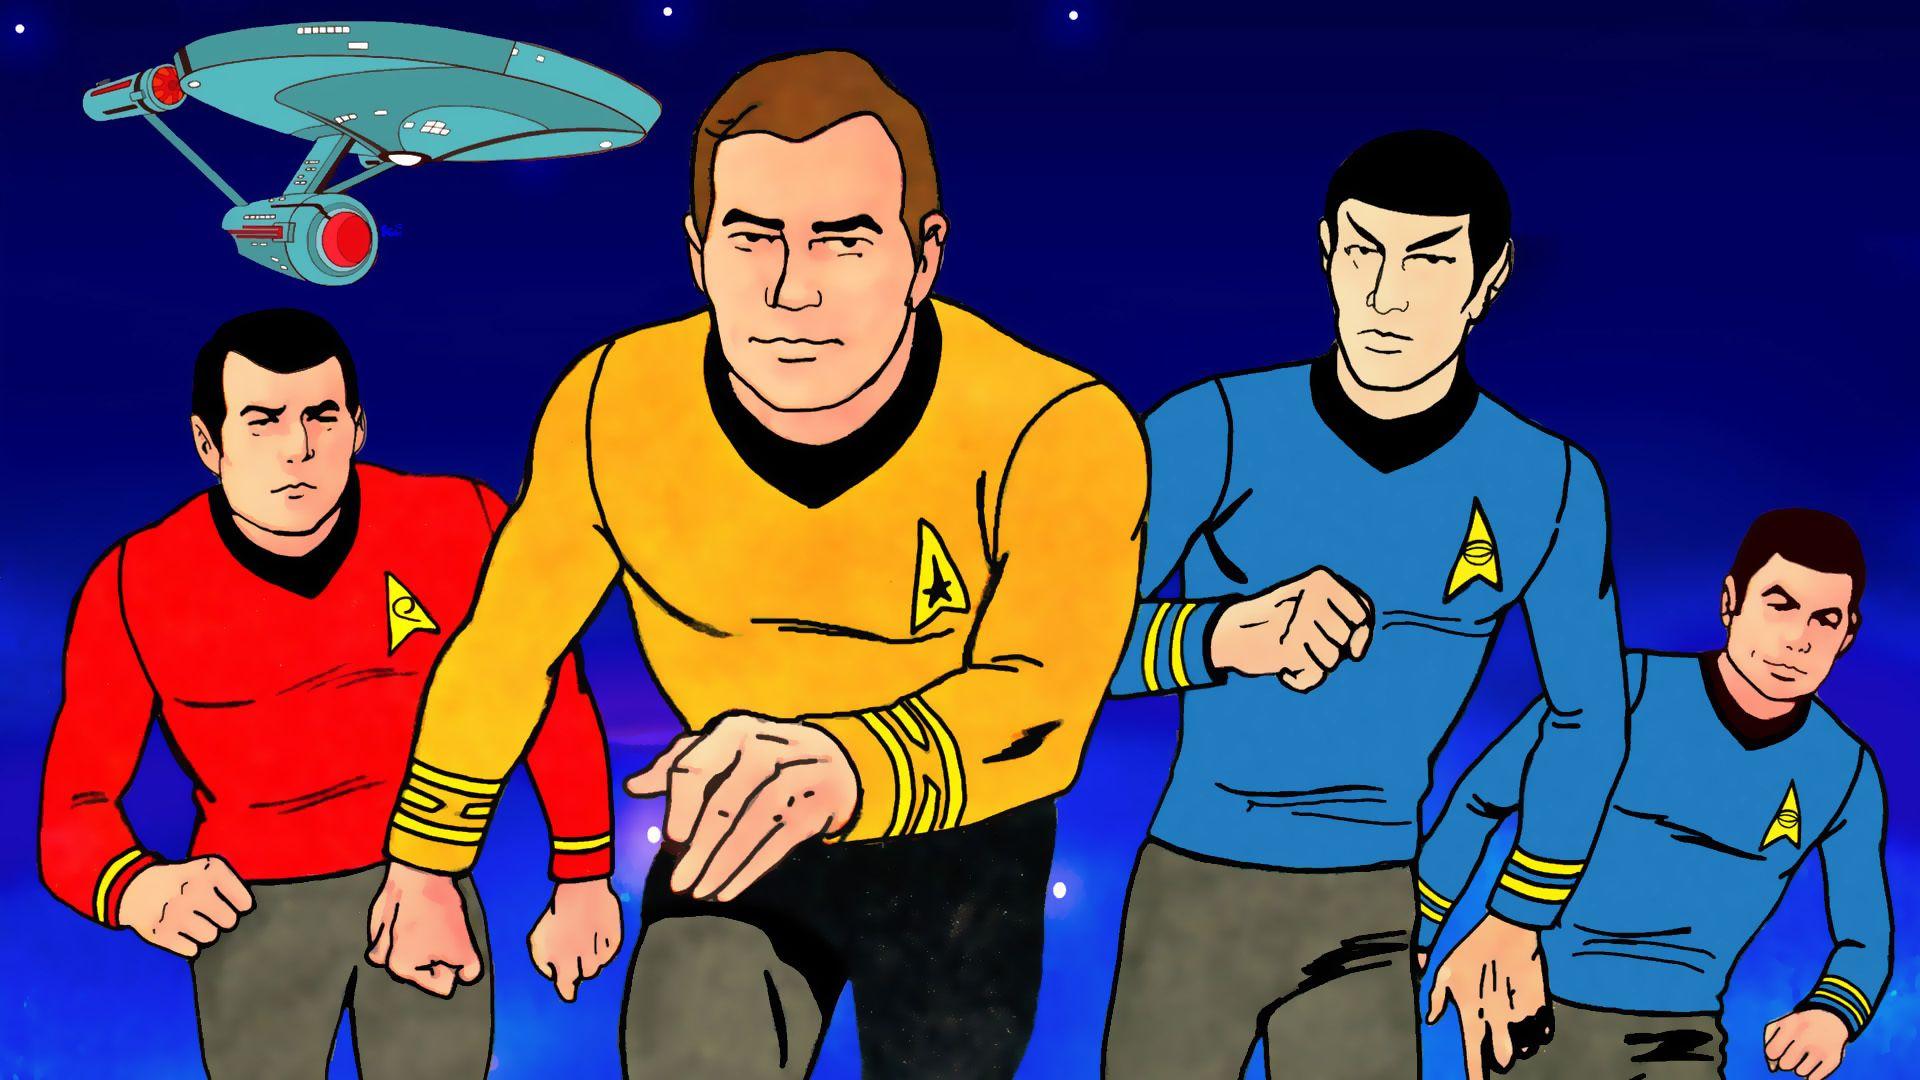 Star Trek Animations From The TV MegaSite